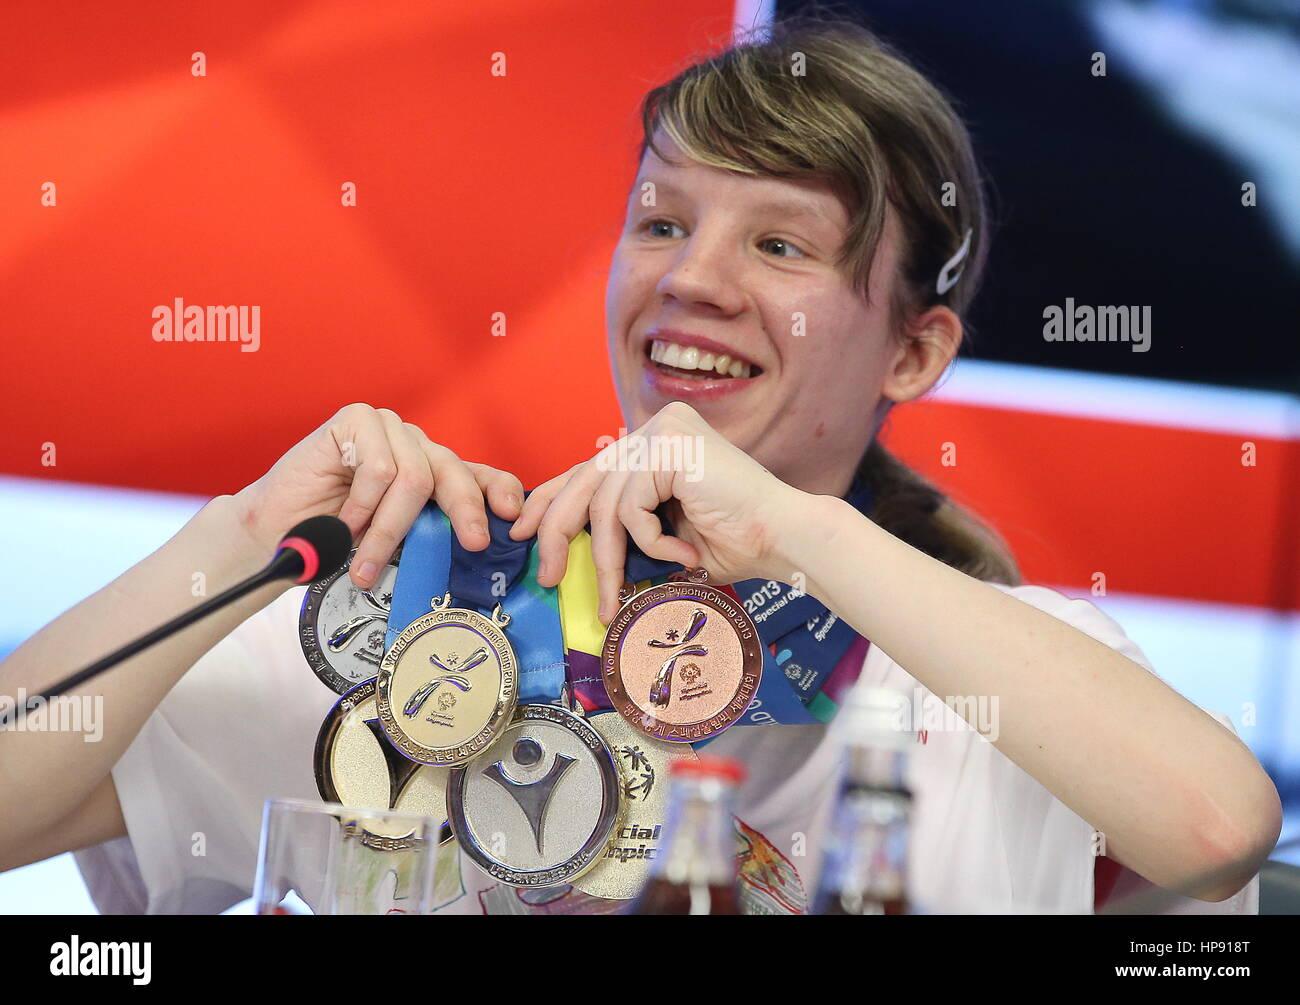 Olympics february 20th celebrity